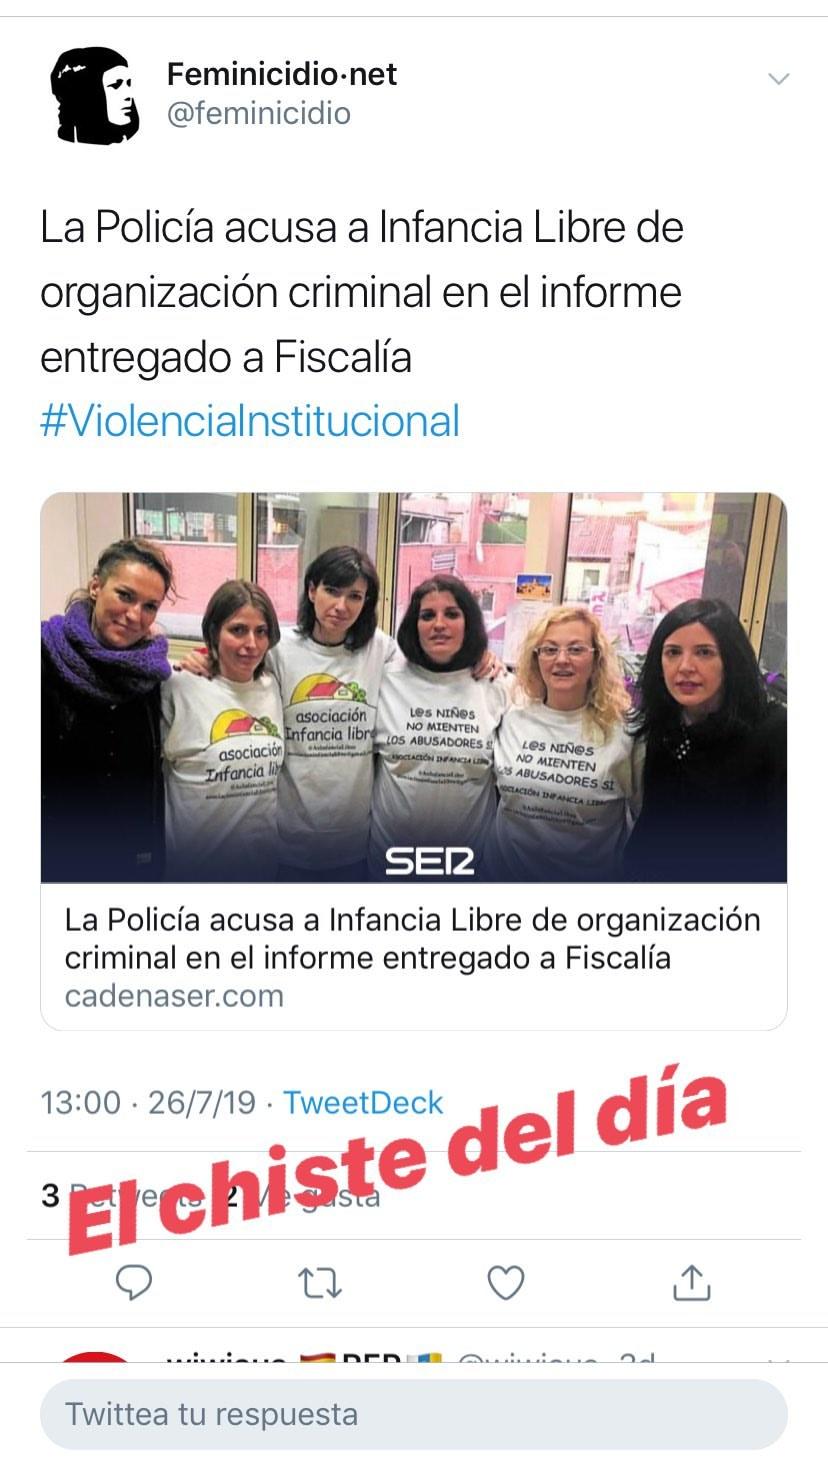 #ViolenciaInstitucional